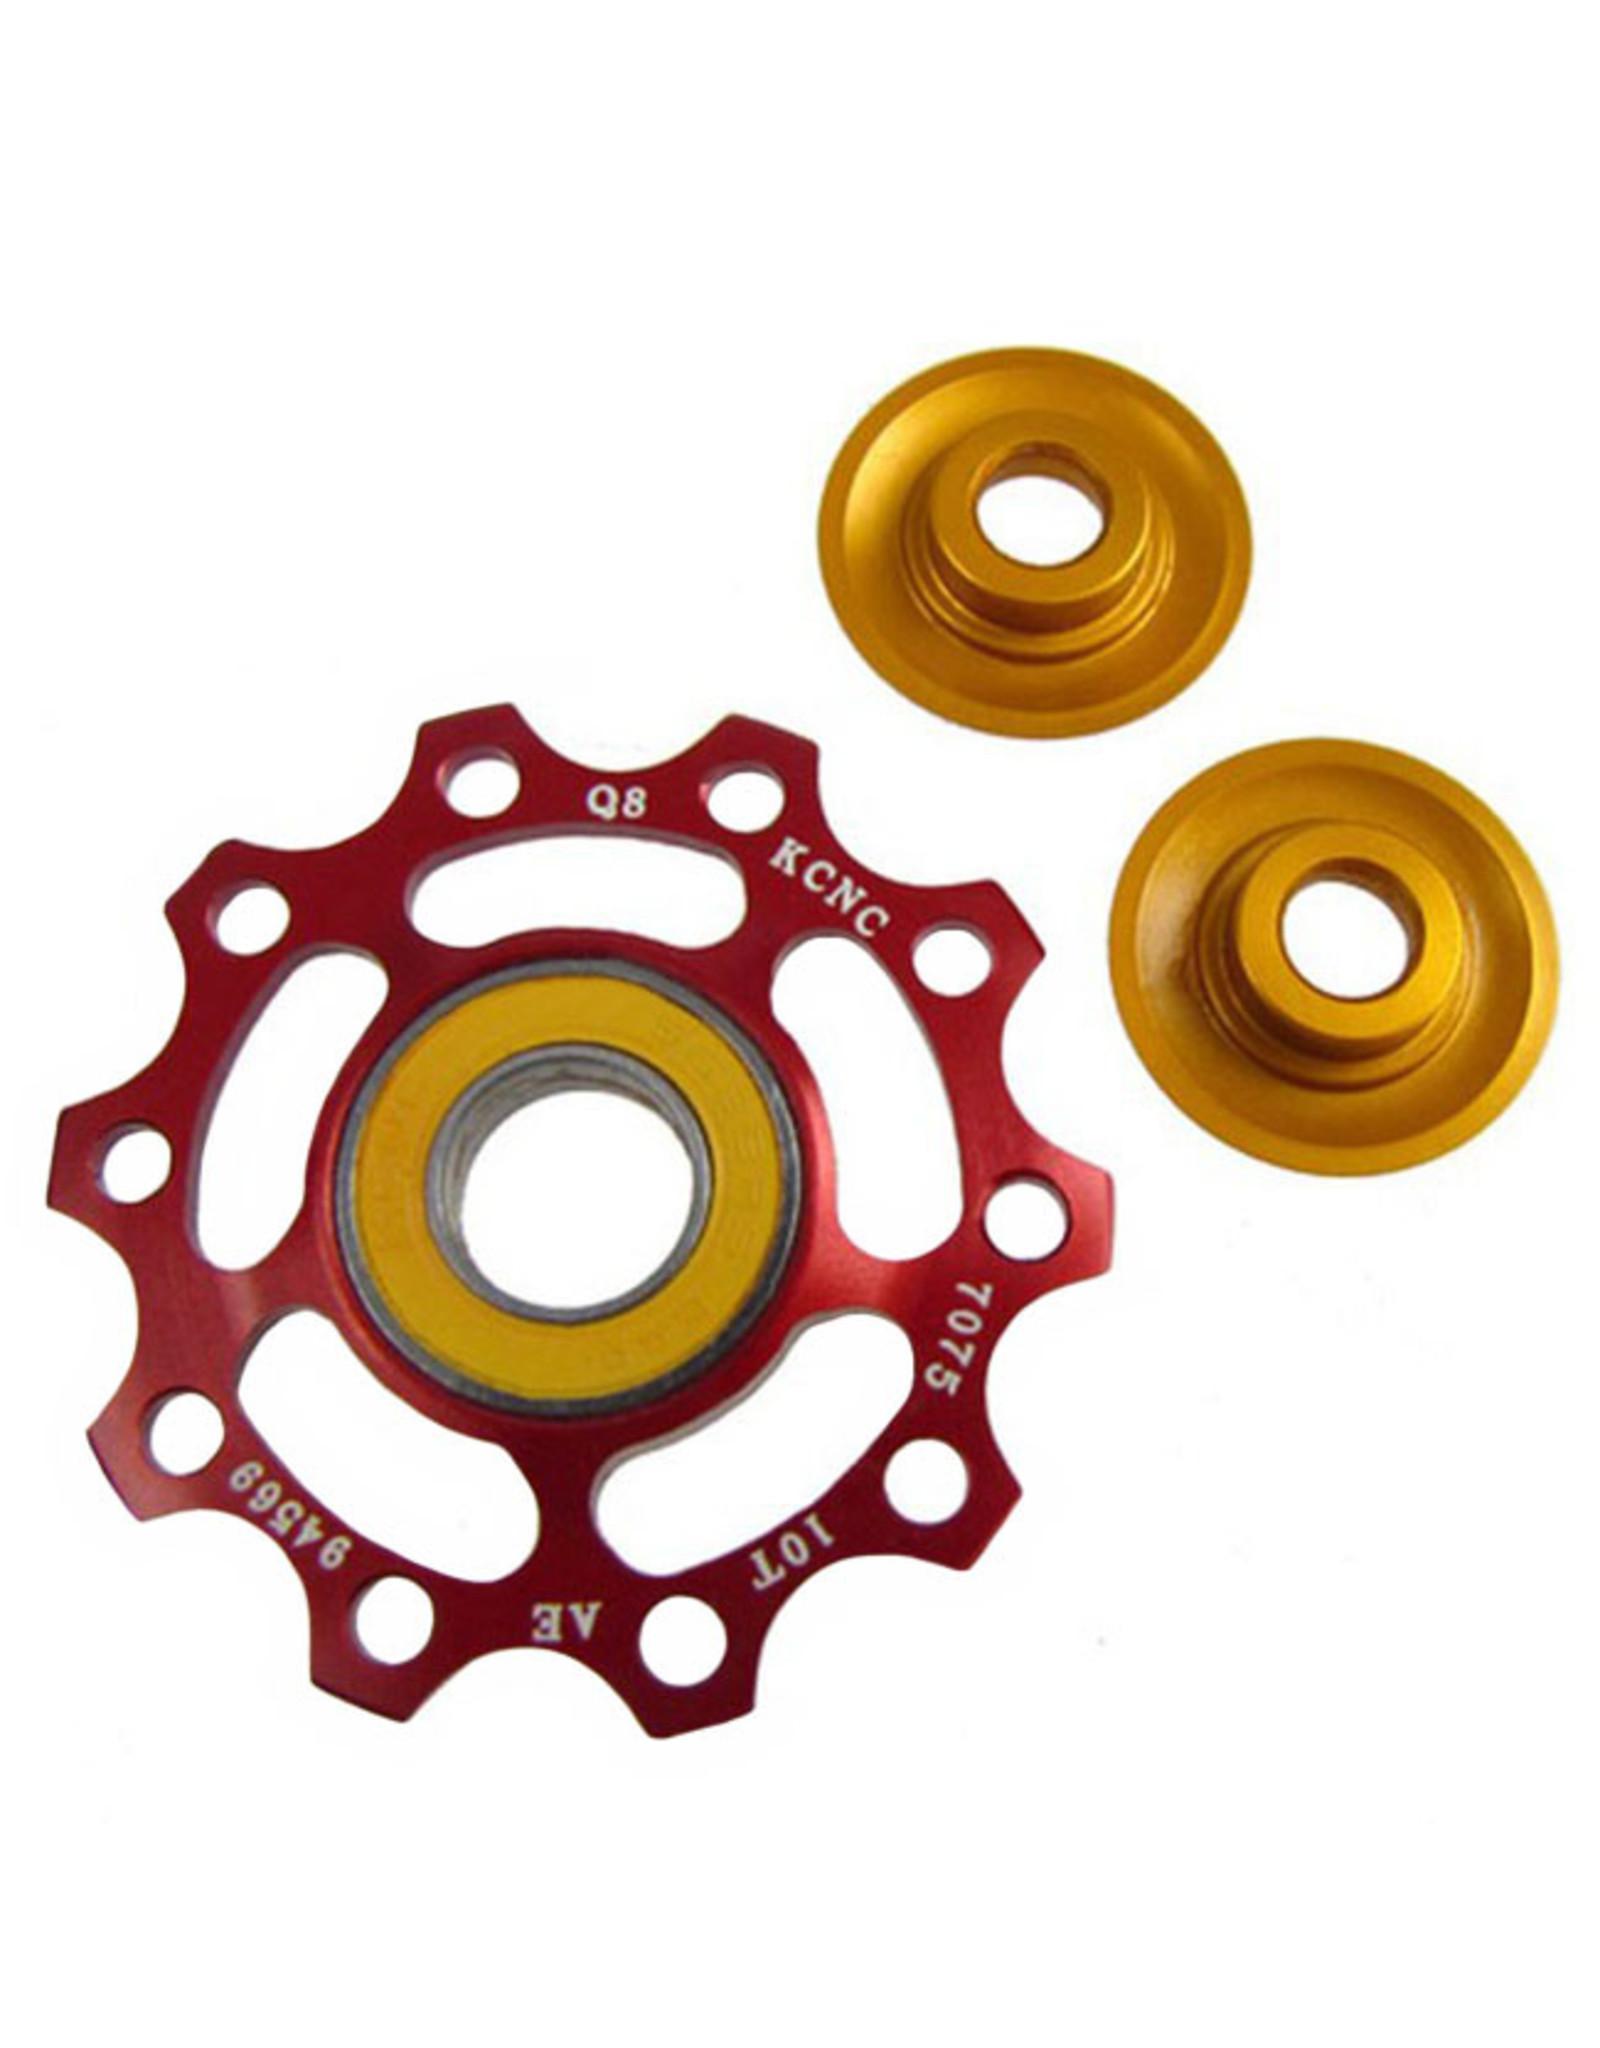 KCNC KCNC Ceramic Pulley Wheel